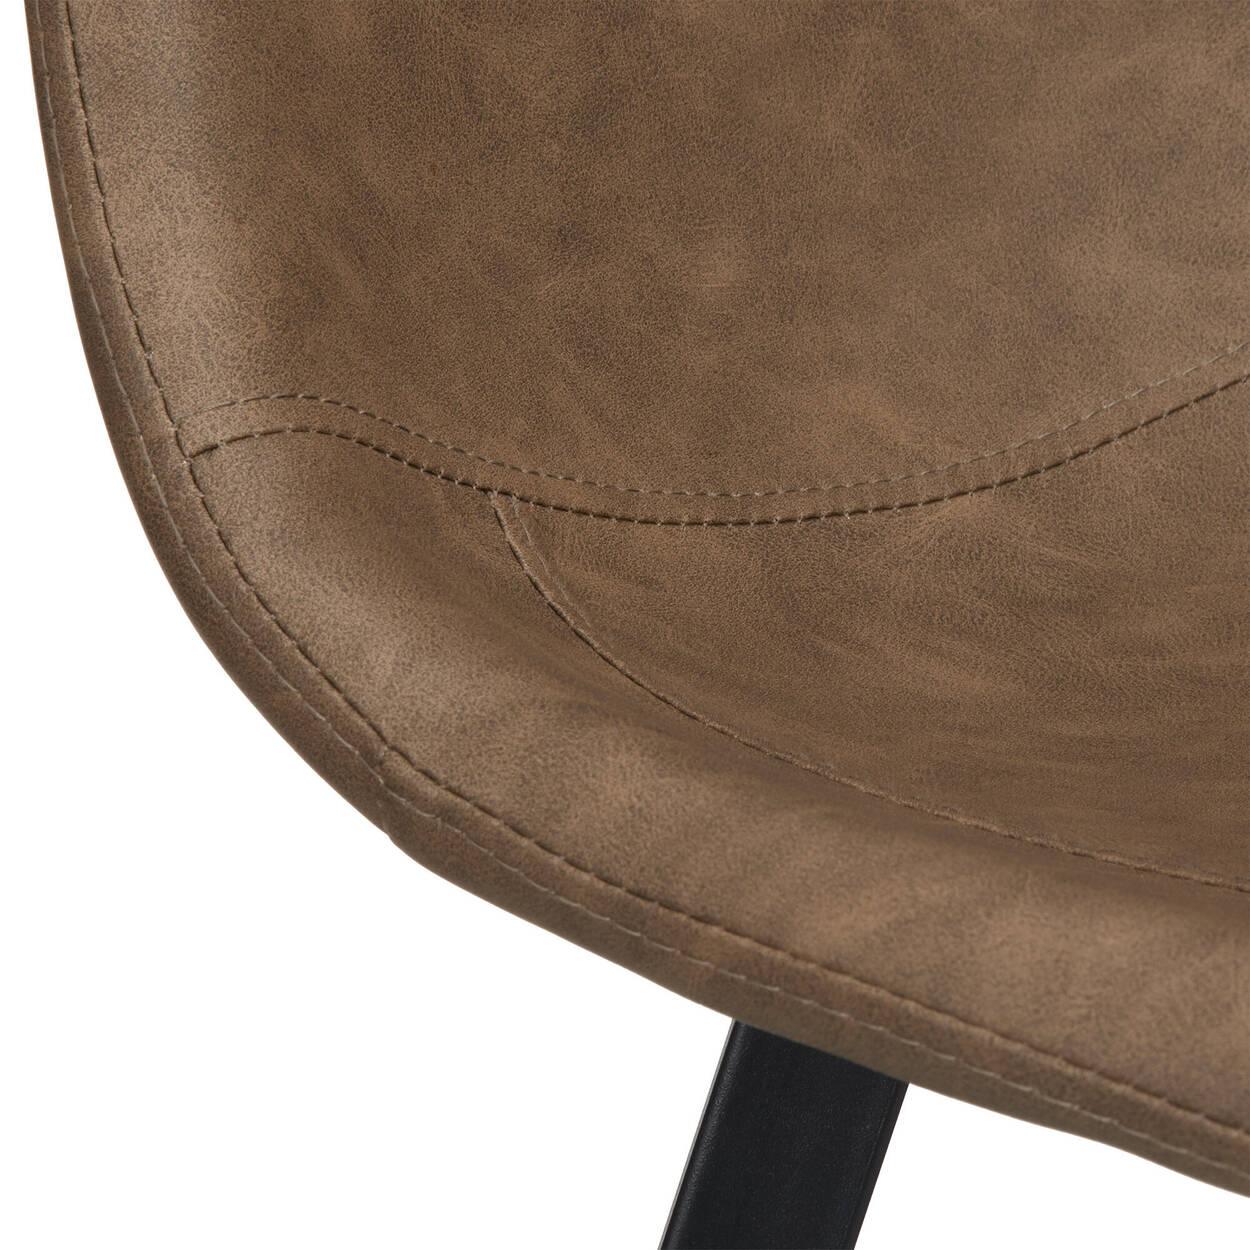 Tabouret de bar en similicuir avec base en métal